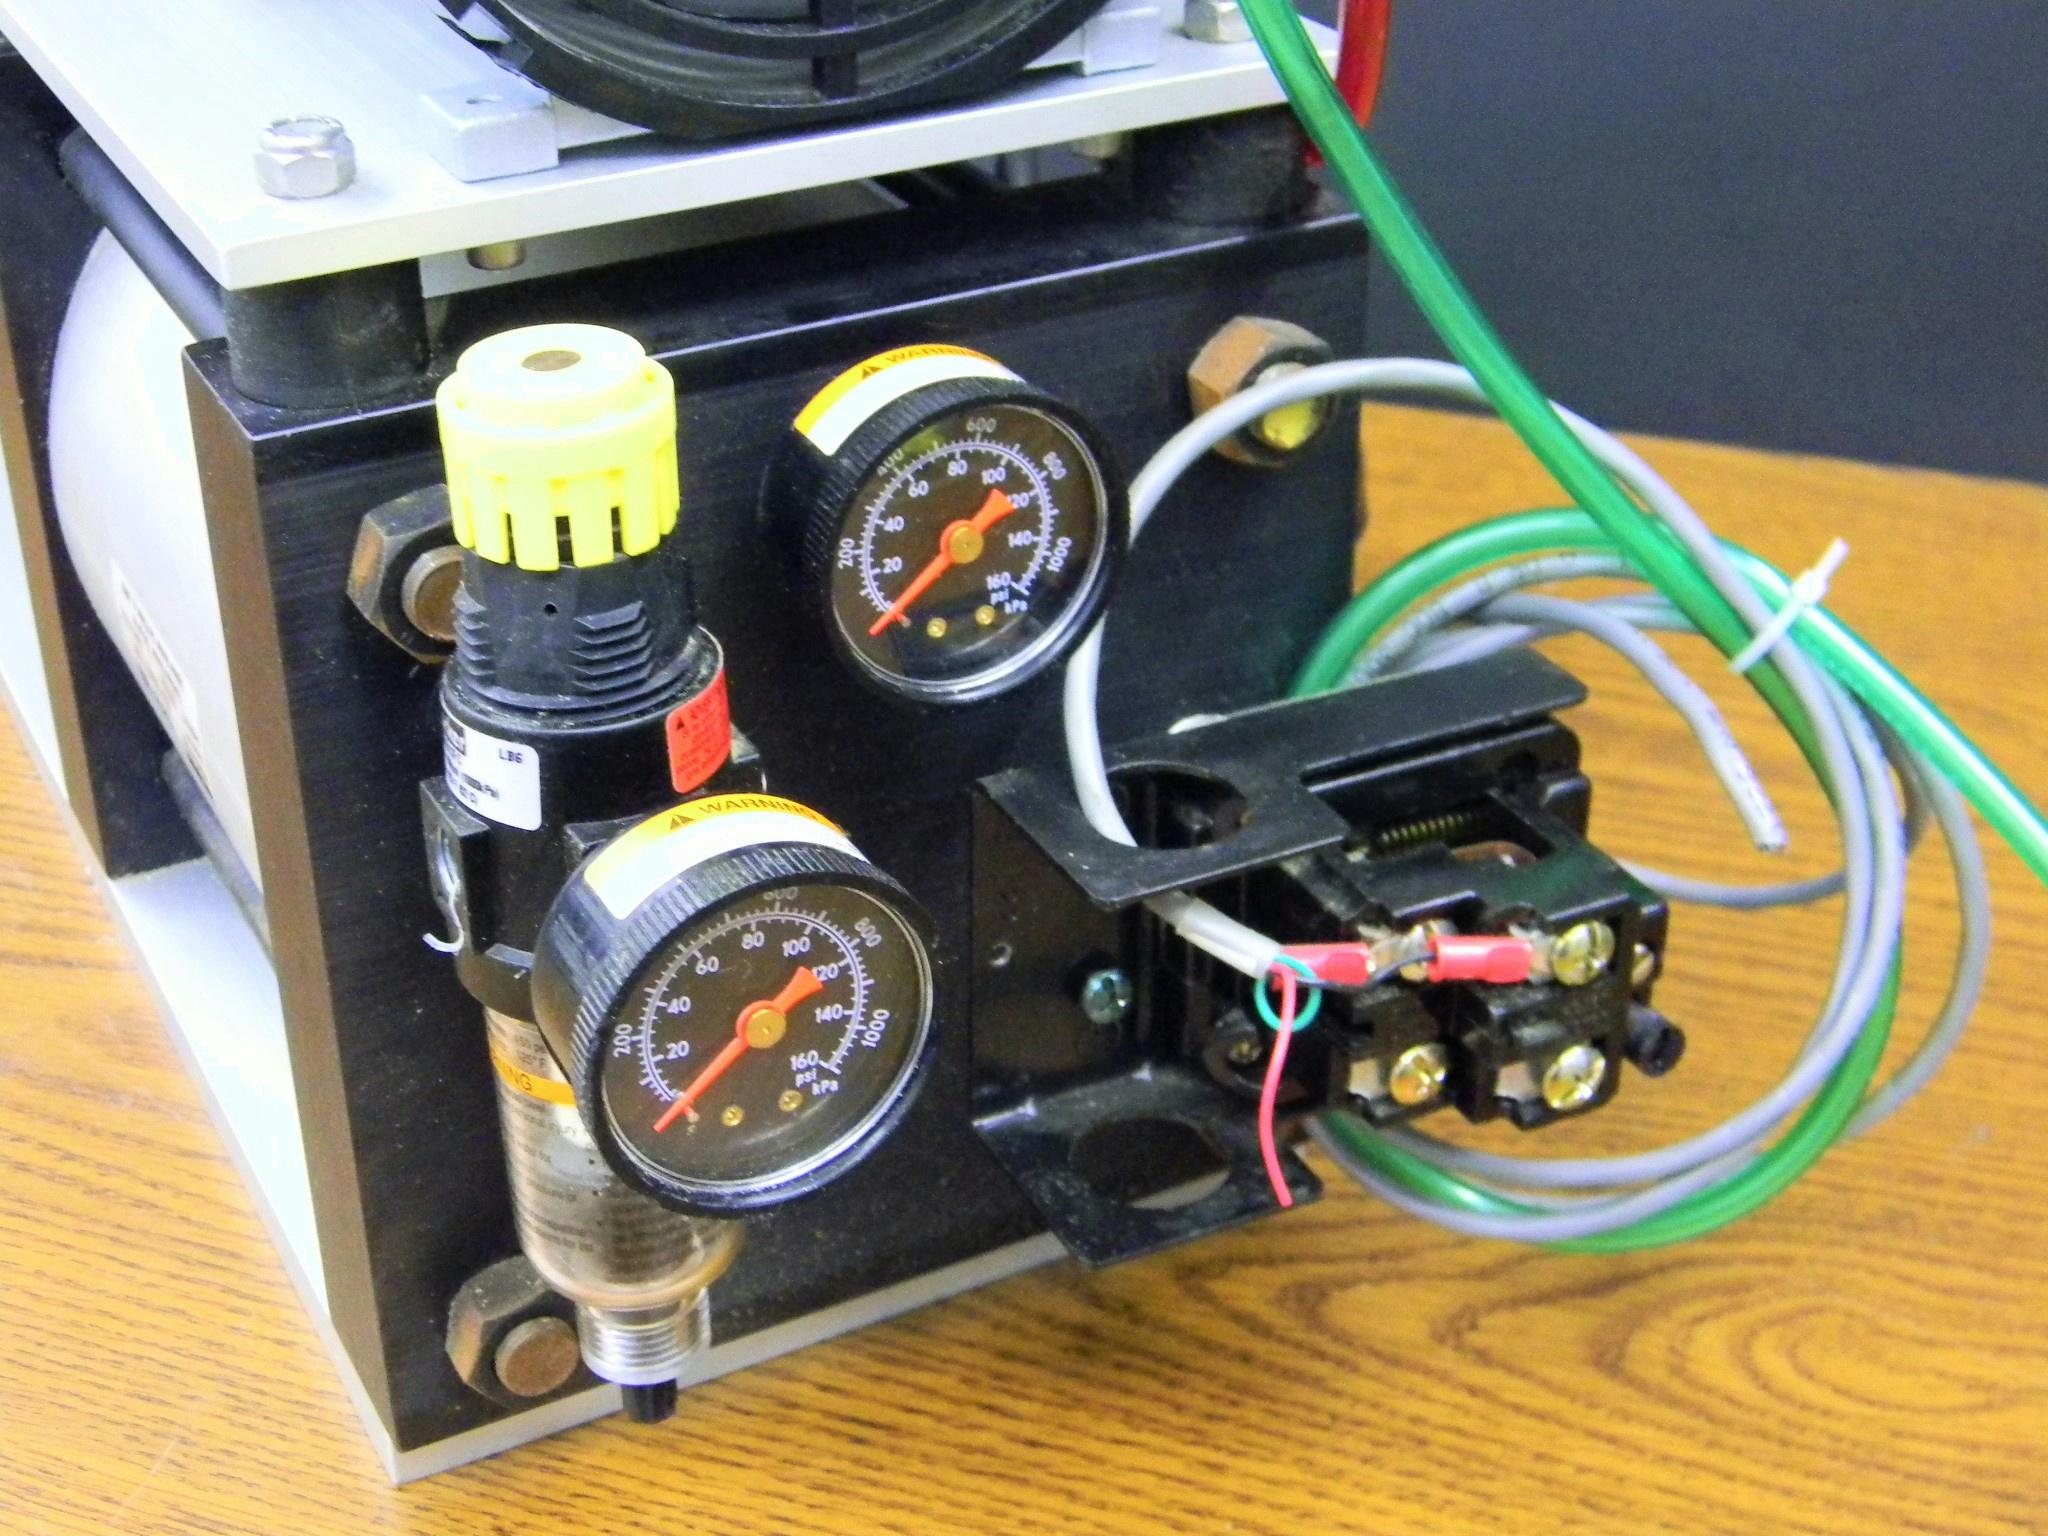 Gast Vacuum Pumps Wiring Diagram Auto Electrical Pump Of Honda